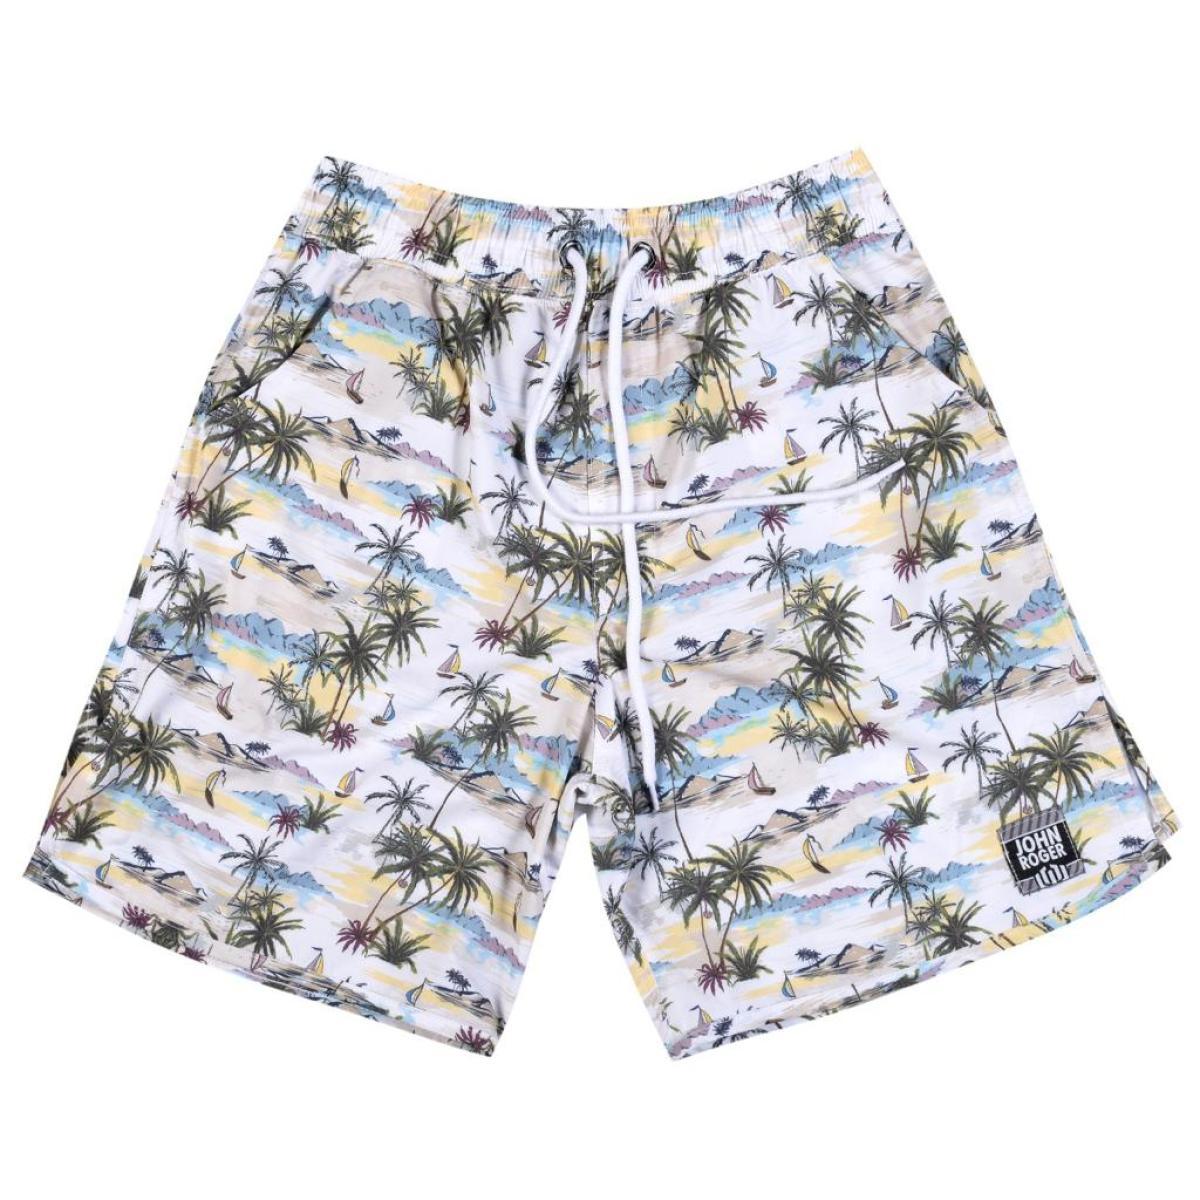 Shorts John Roger - Beach Texture